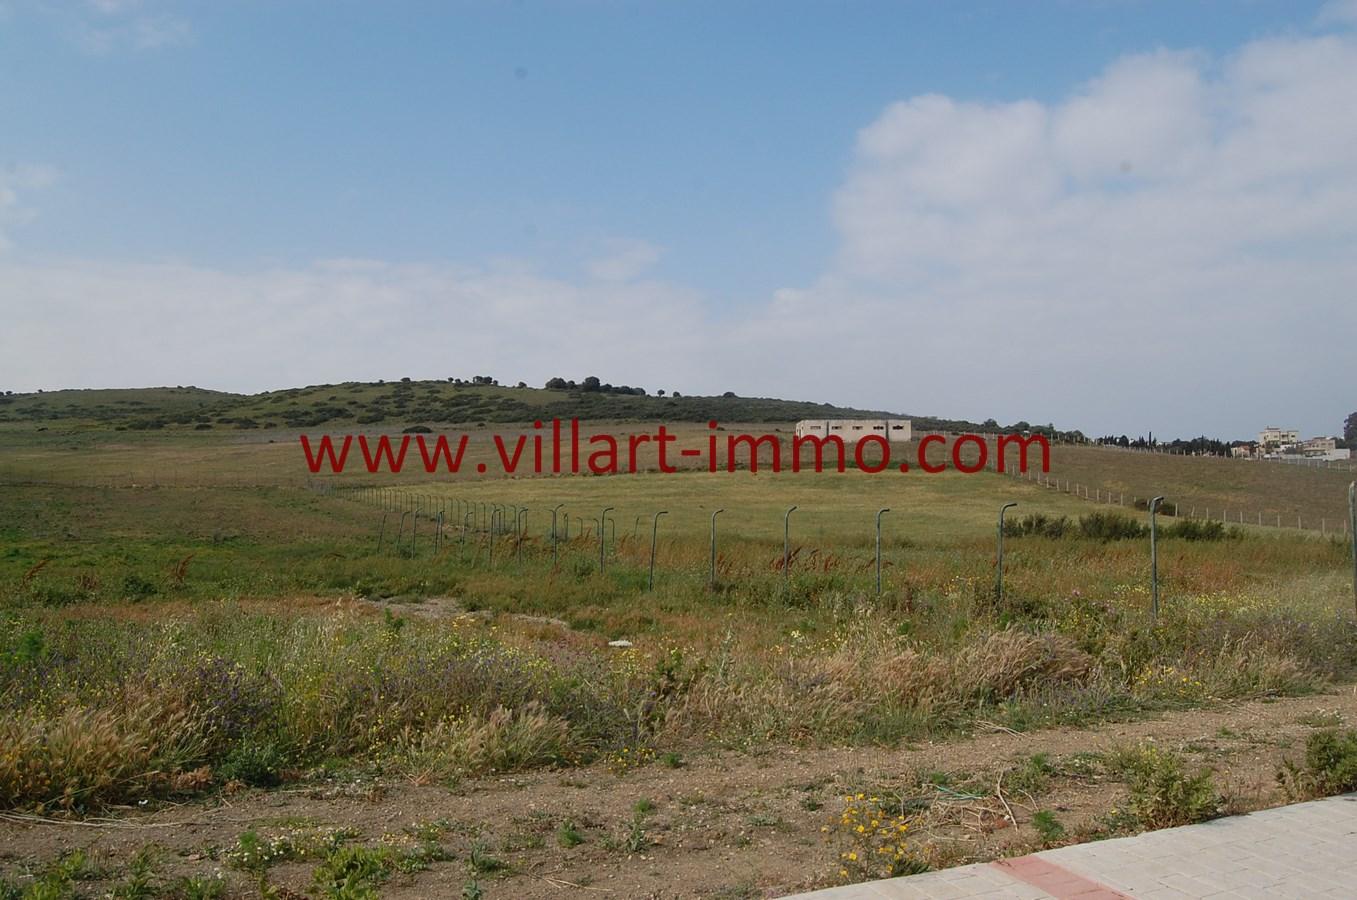 2-Vente-Terrain-Tanger-Jbilat-VT26-Villart Immo